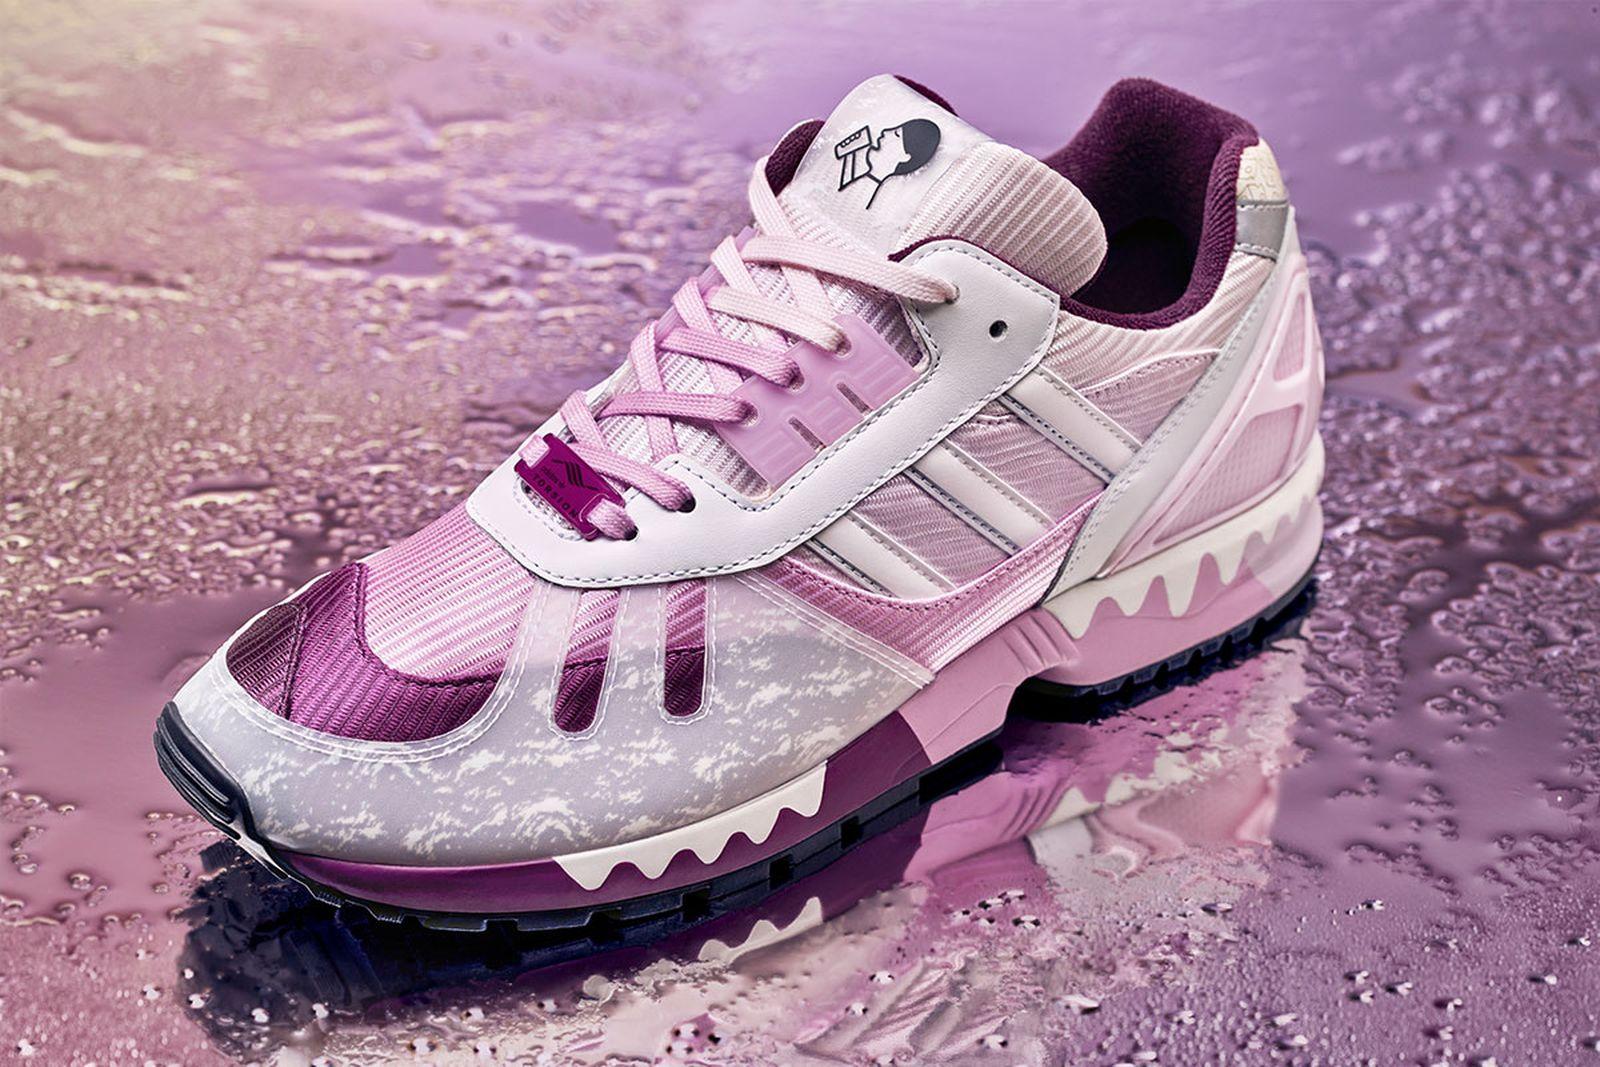 adidas-heytea-zx-7000-release-date-price-03